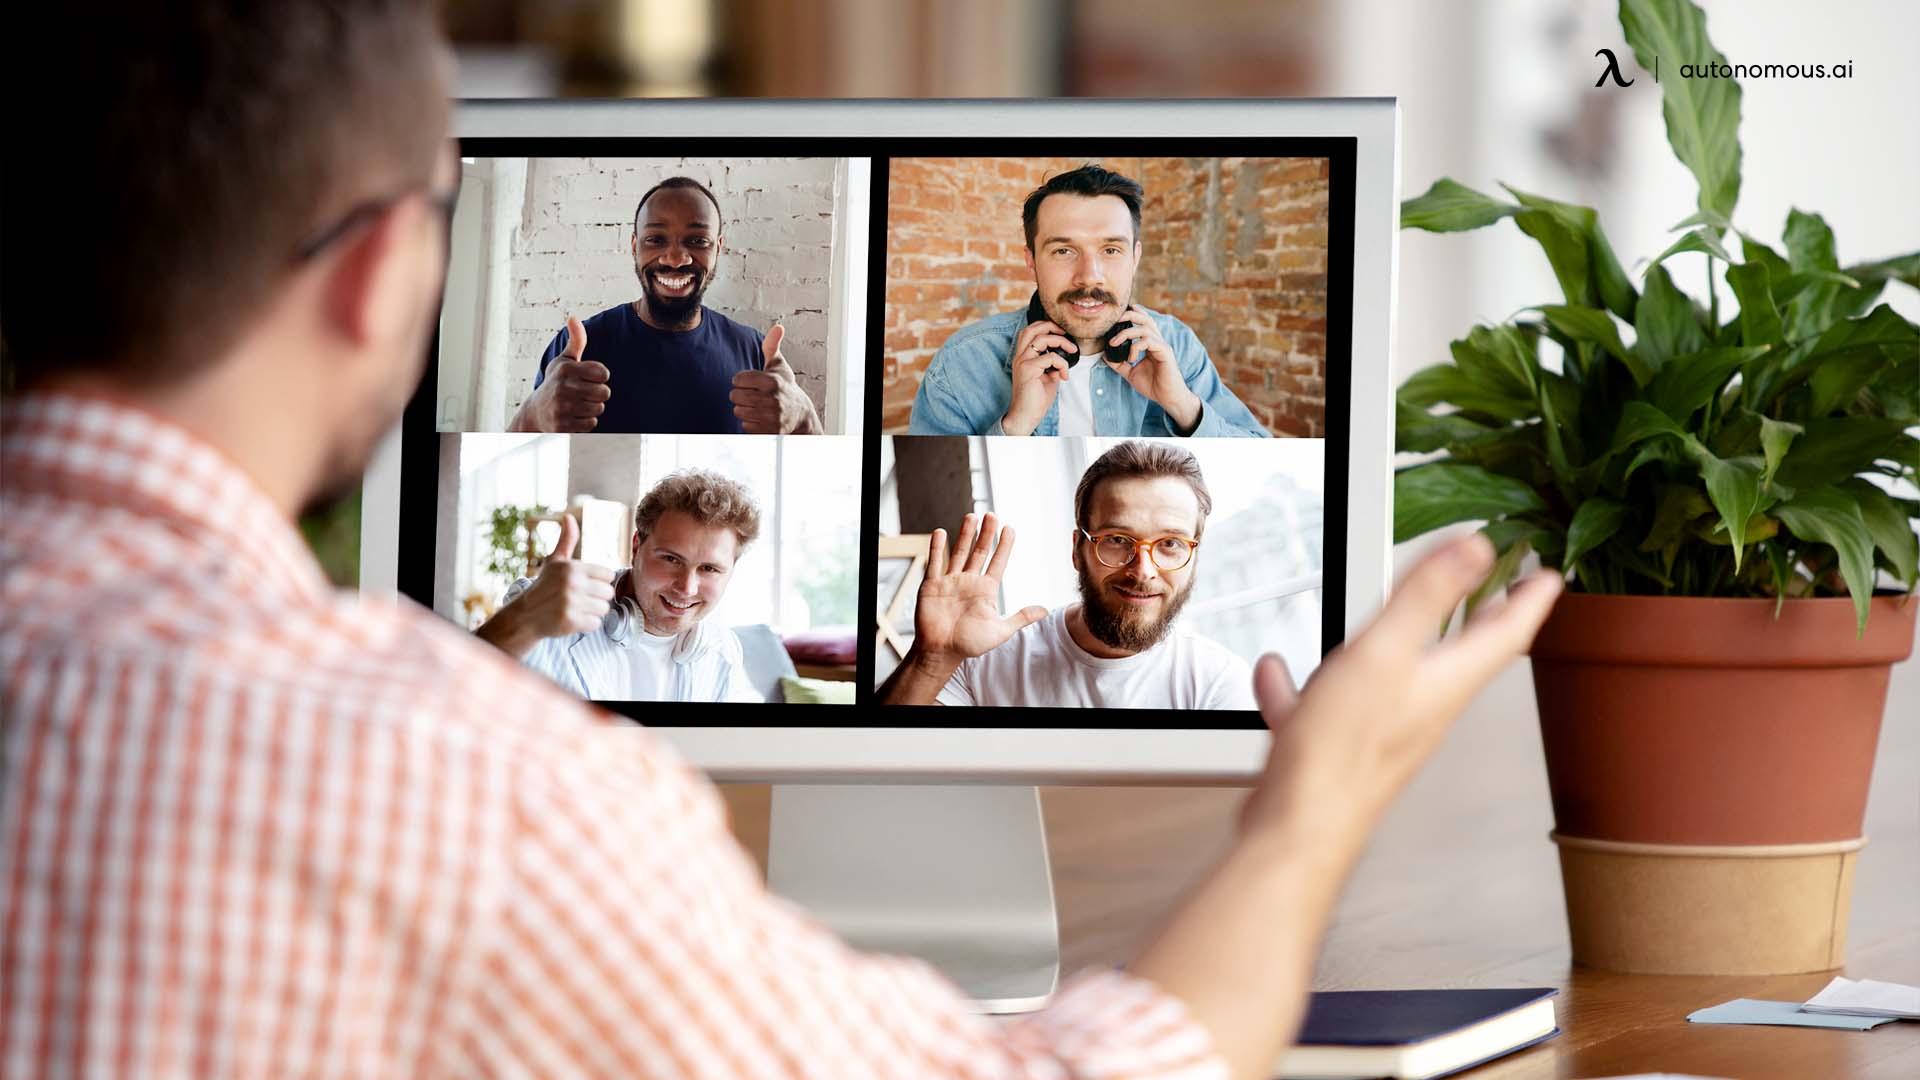 collaboration in remote work